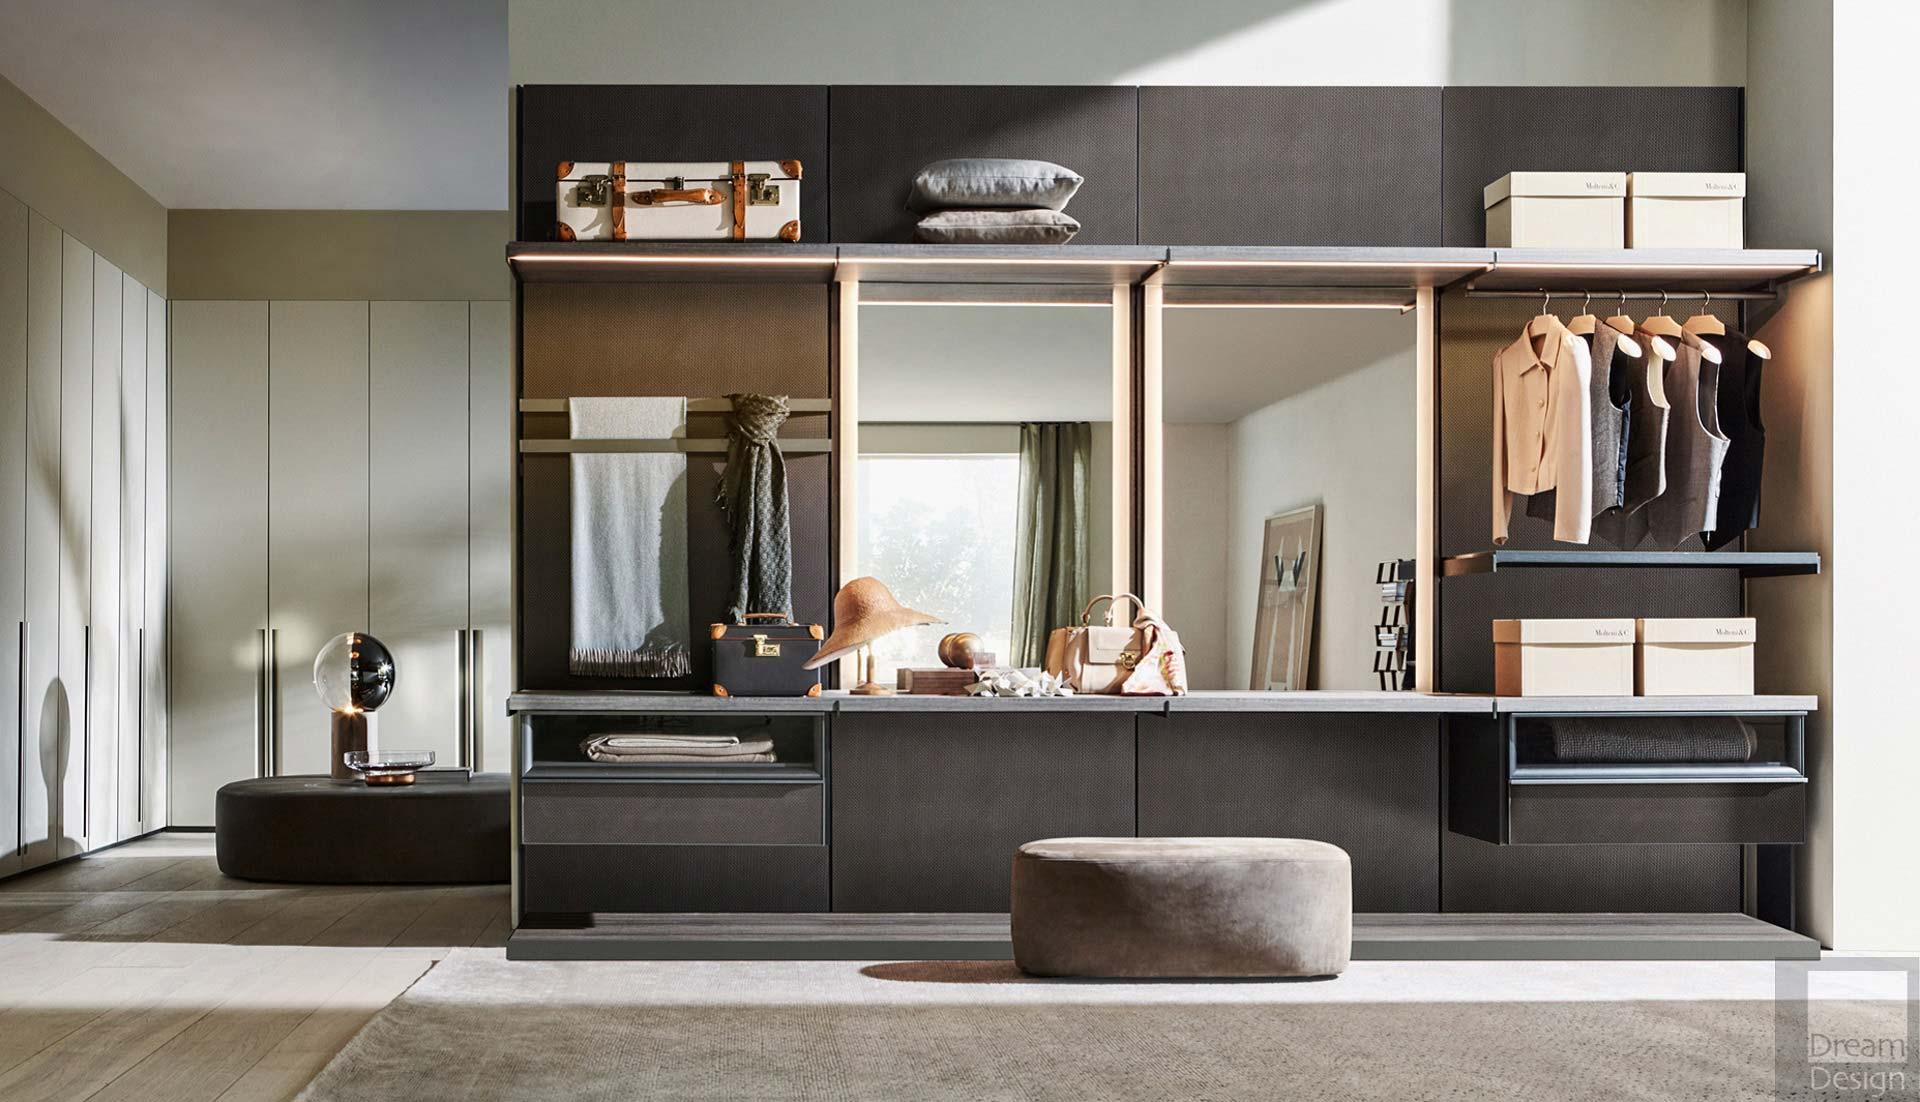 Molteni C Gliss Master Dressing Dream Design Interiors Ltd